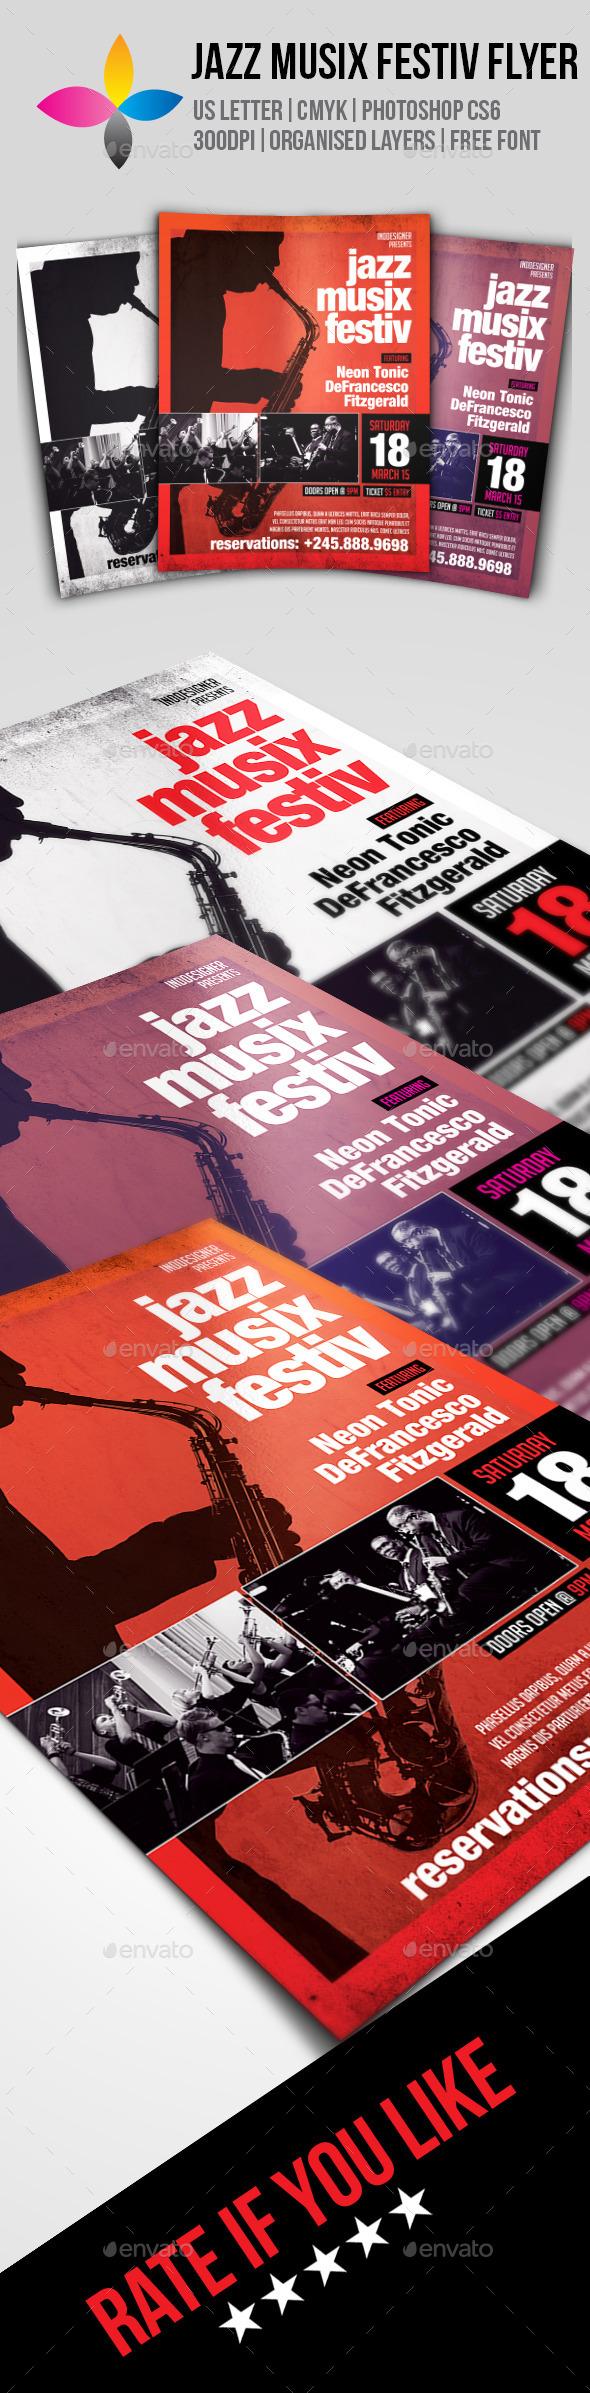 GraphicRiver Jazz Musix Festiv Flyer 10067422